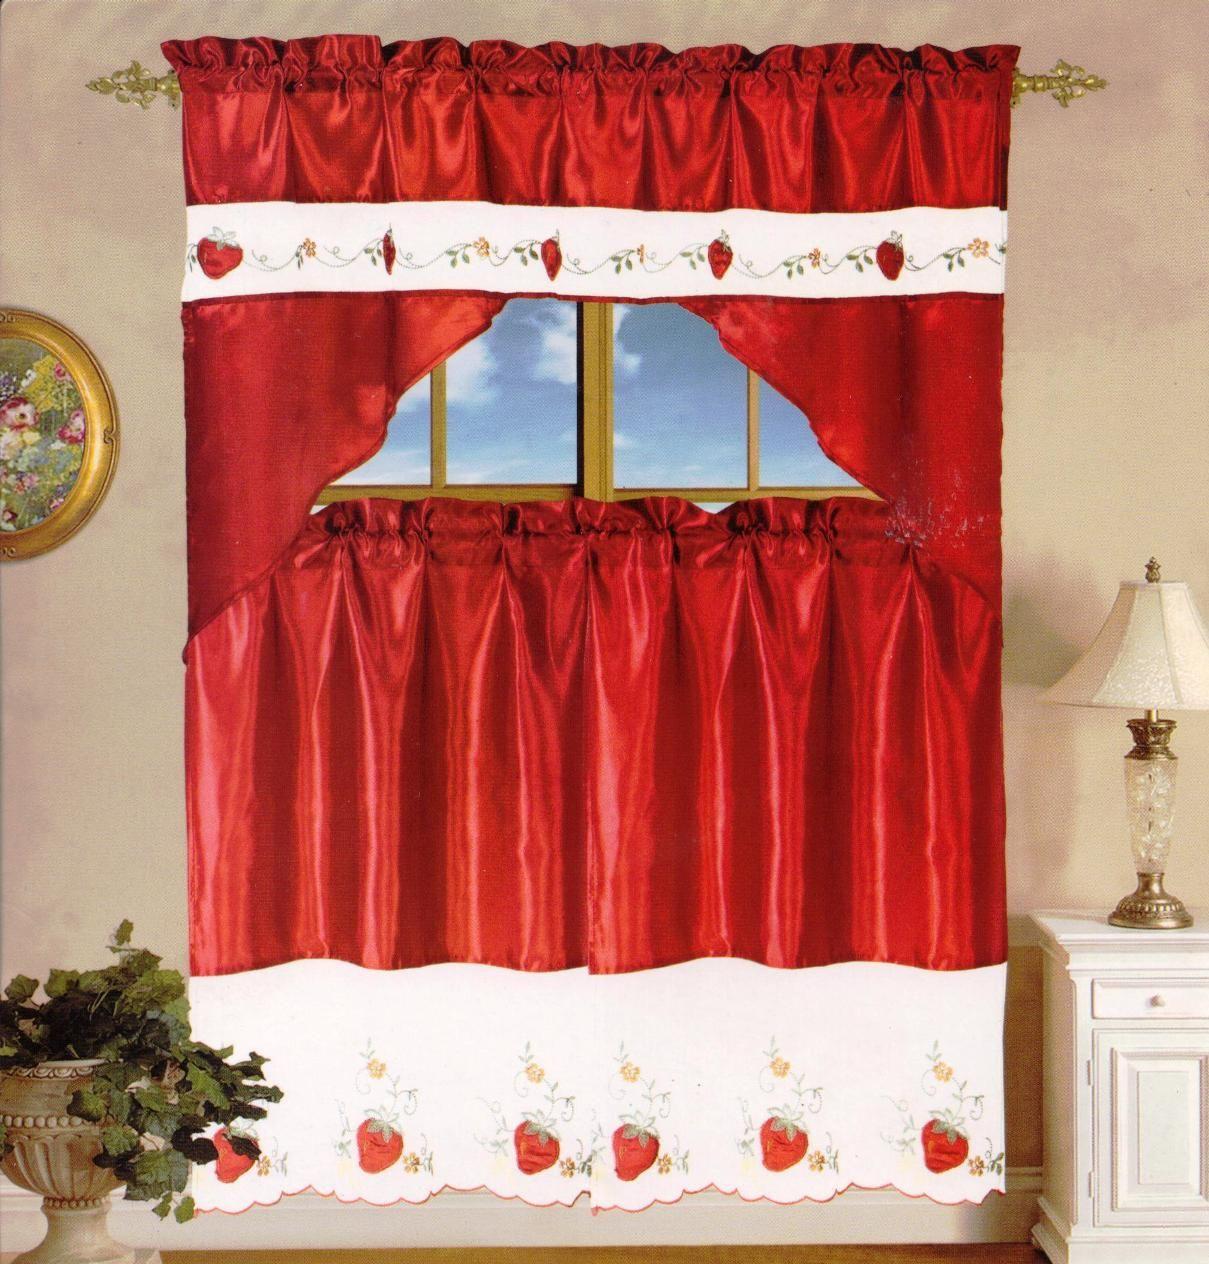 strawberry curtains | Strawberry Kitchen Curtain ...